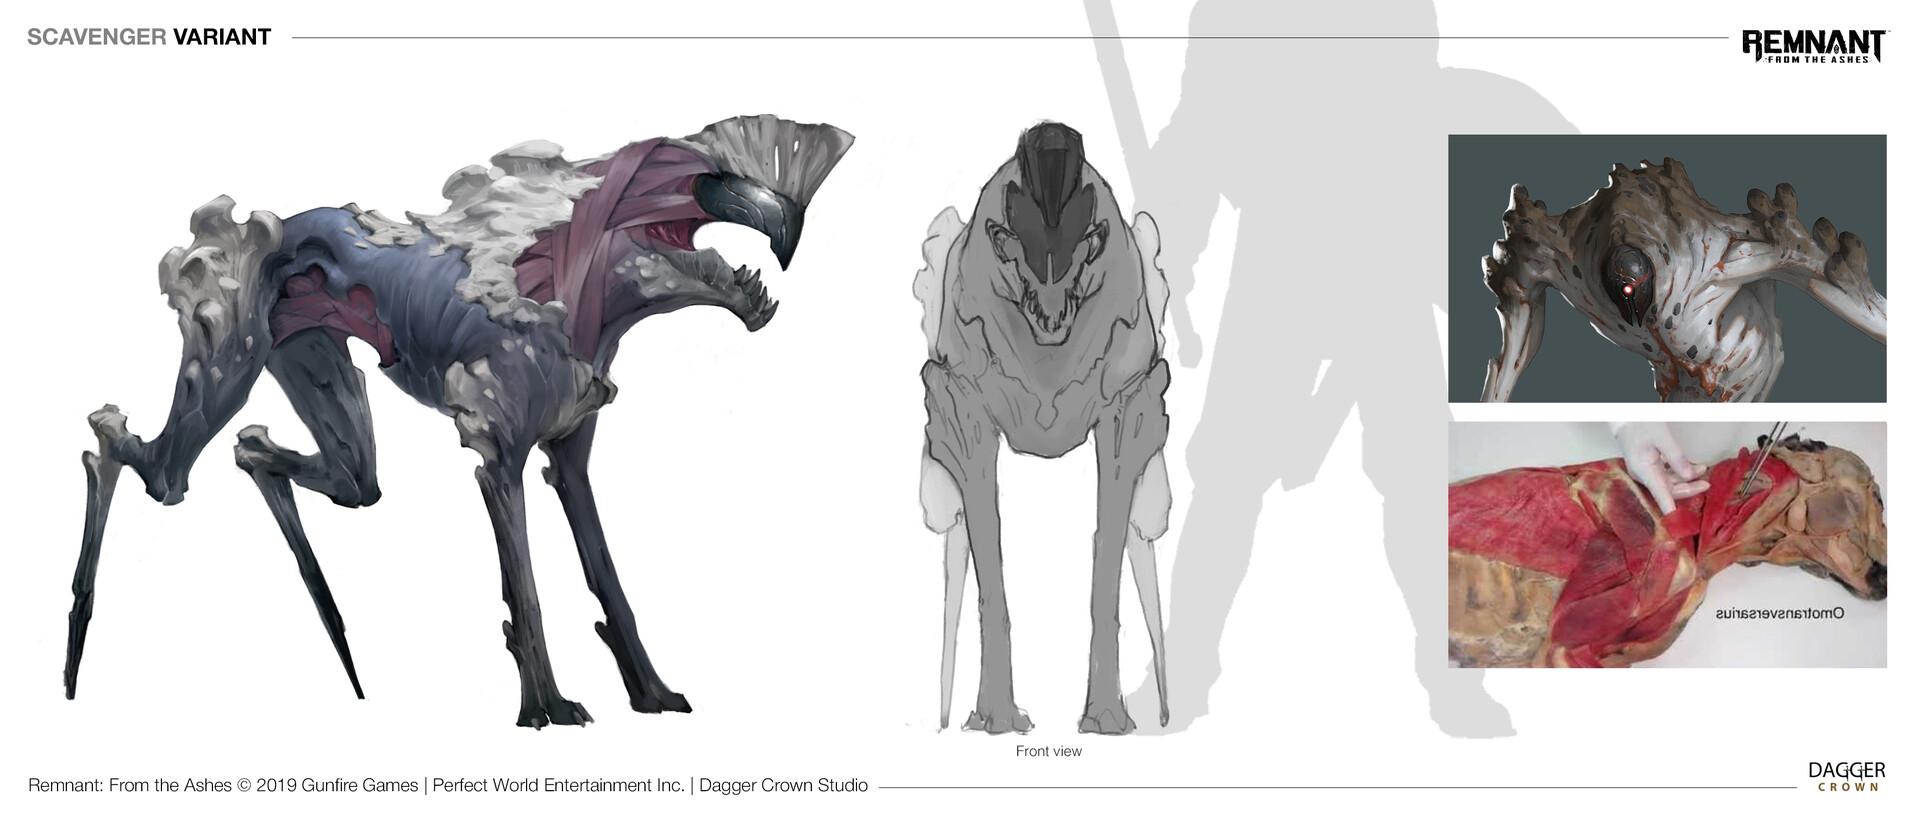 Irina nordsol kuzmina scavenger v2 concept sheet